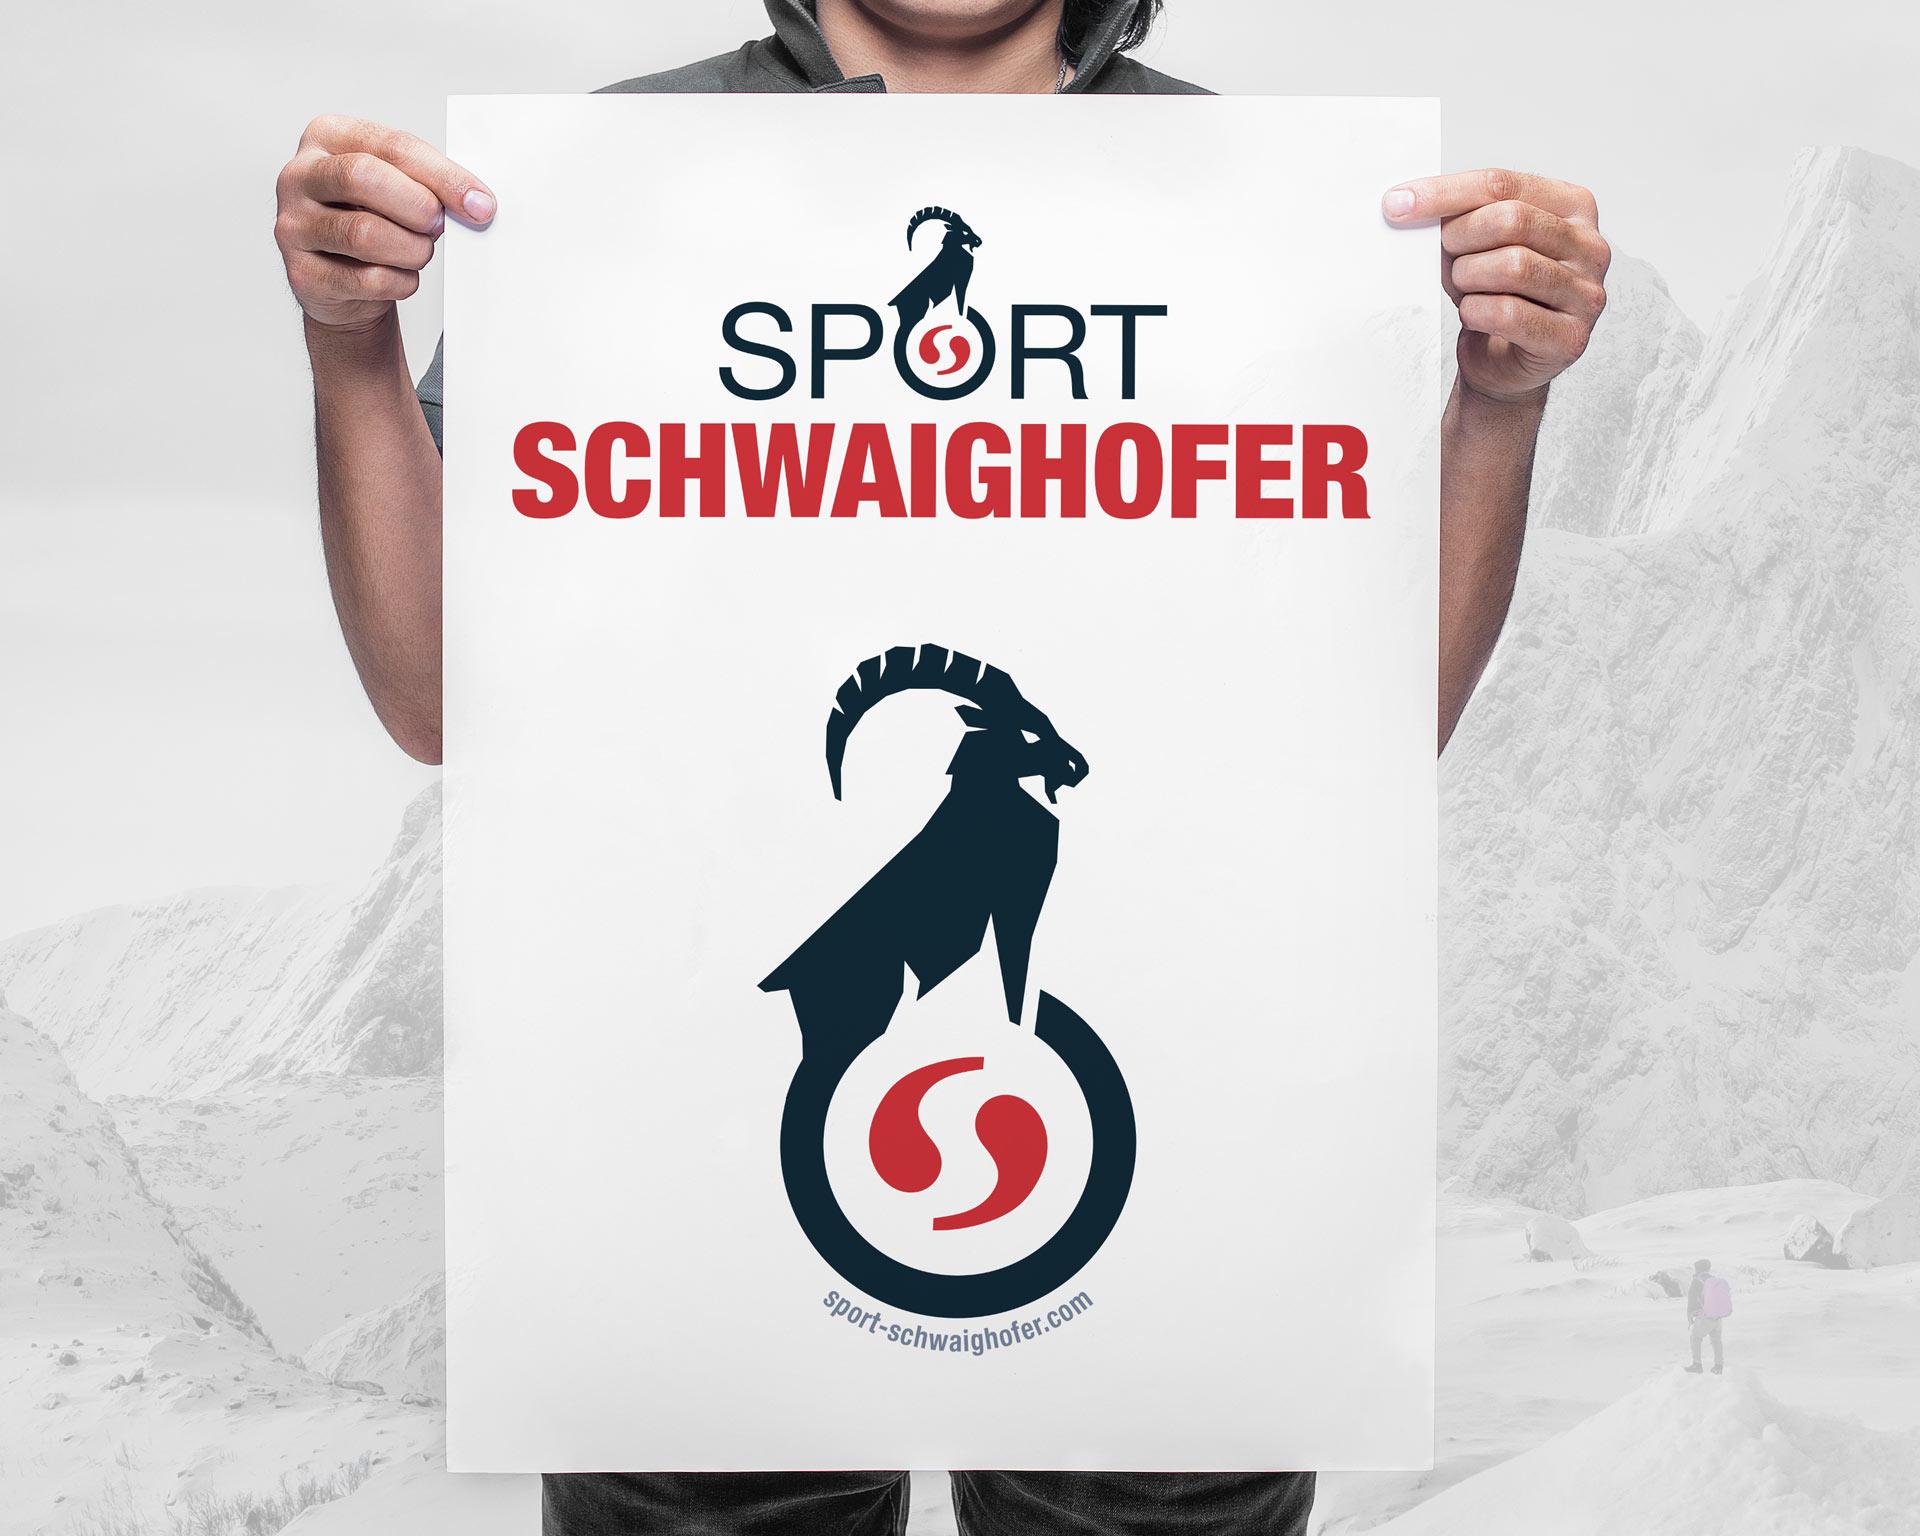 agentur 13, Werbeagentur Tirol, Sport Schwaighofer, Logodesign